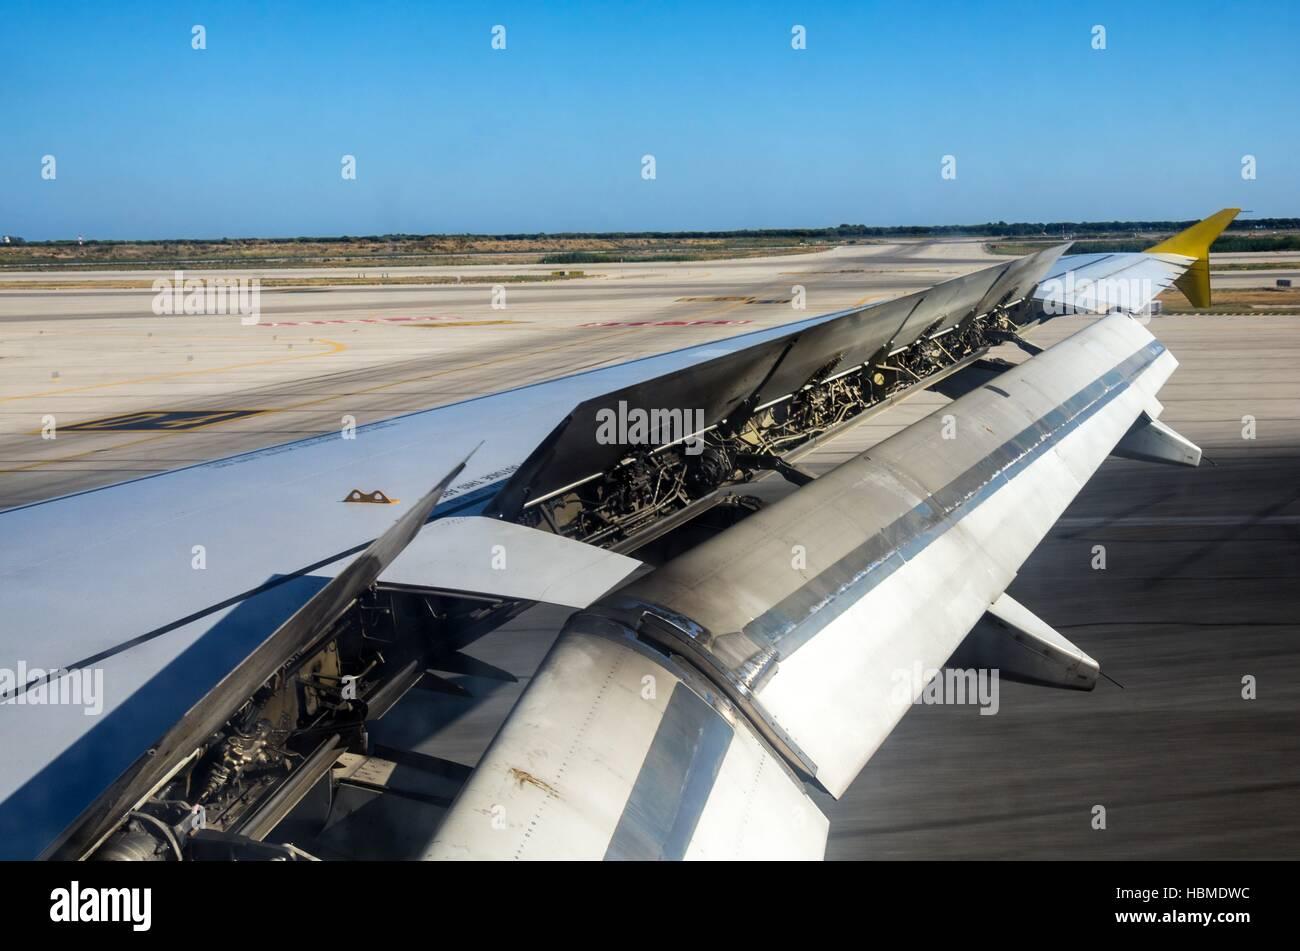 engines Advance landing flaps - Stock Image